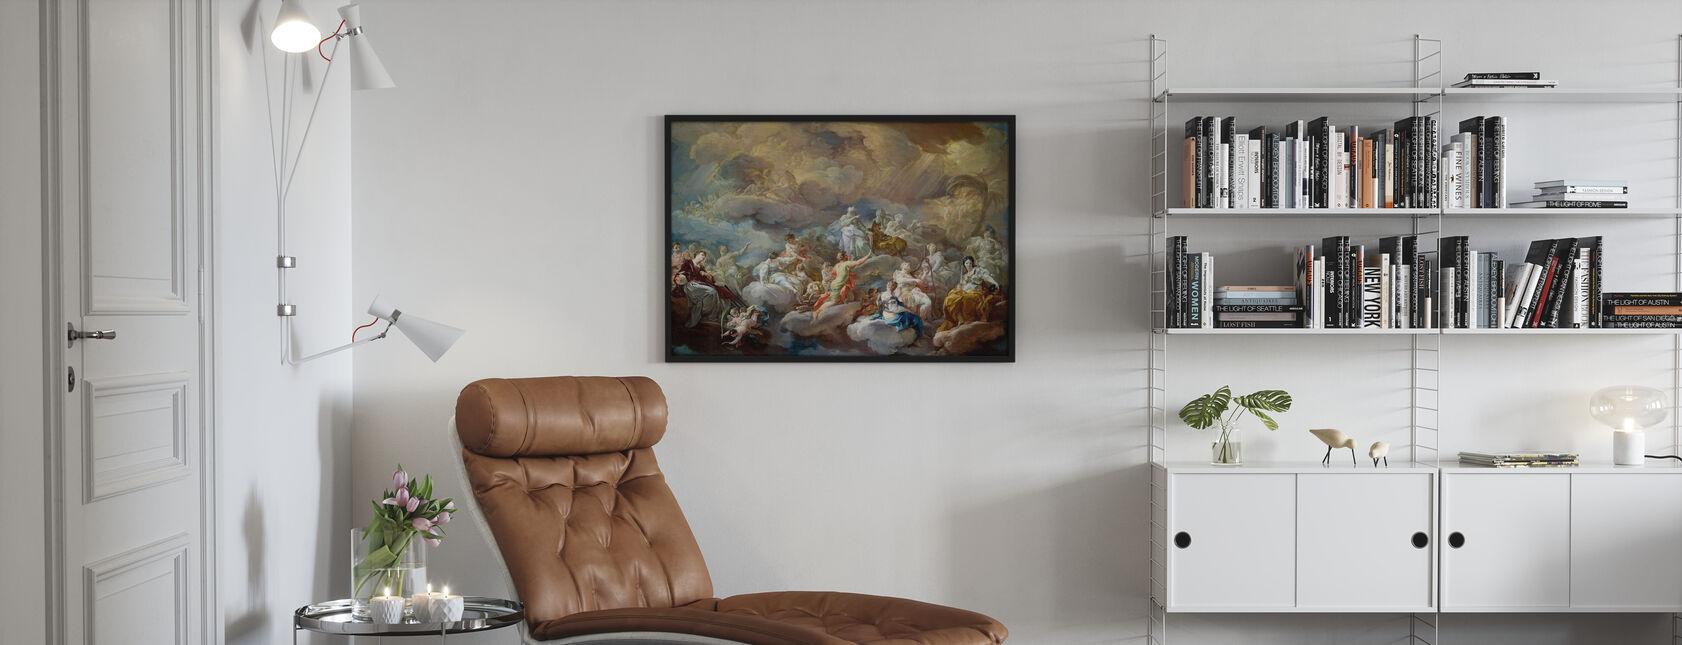 Saints in Glory - Corrado Giaquinto - Poster - Living Room